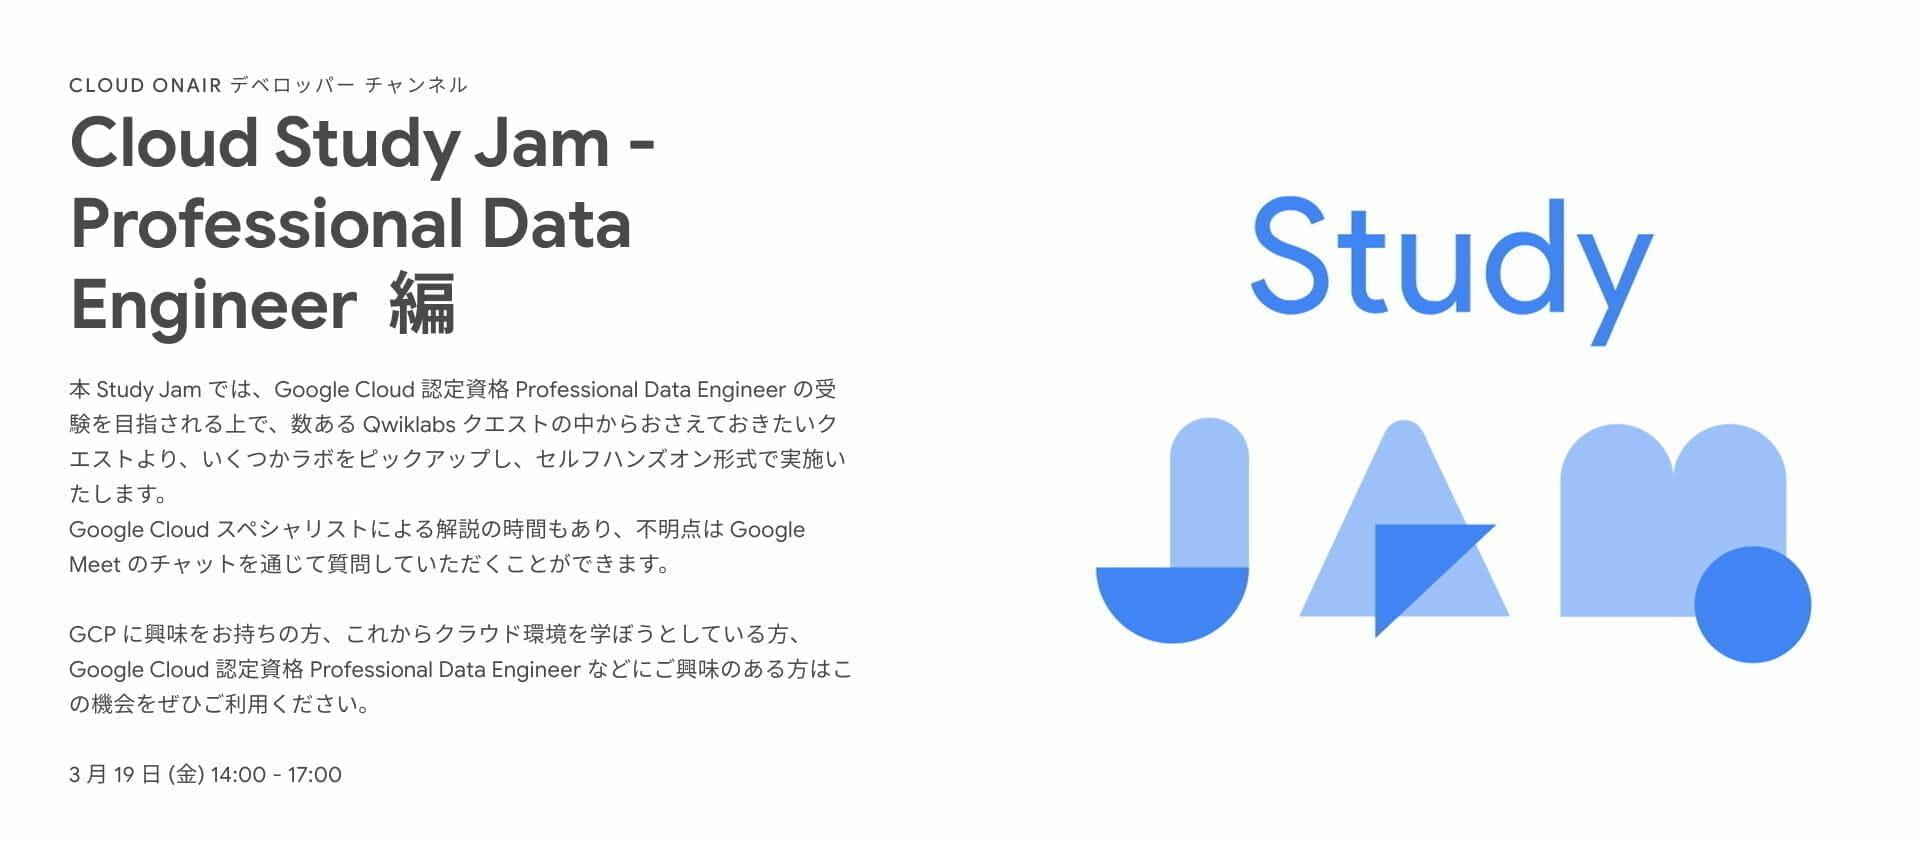 [GCP] Cloud Study Jam - Professional Data Engineer 編